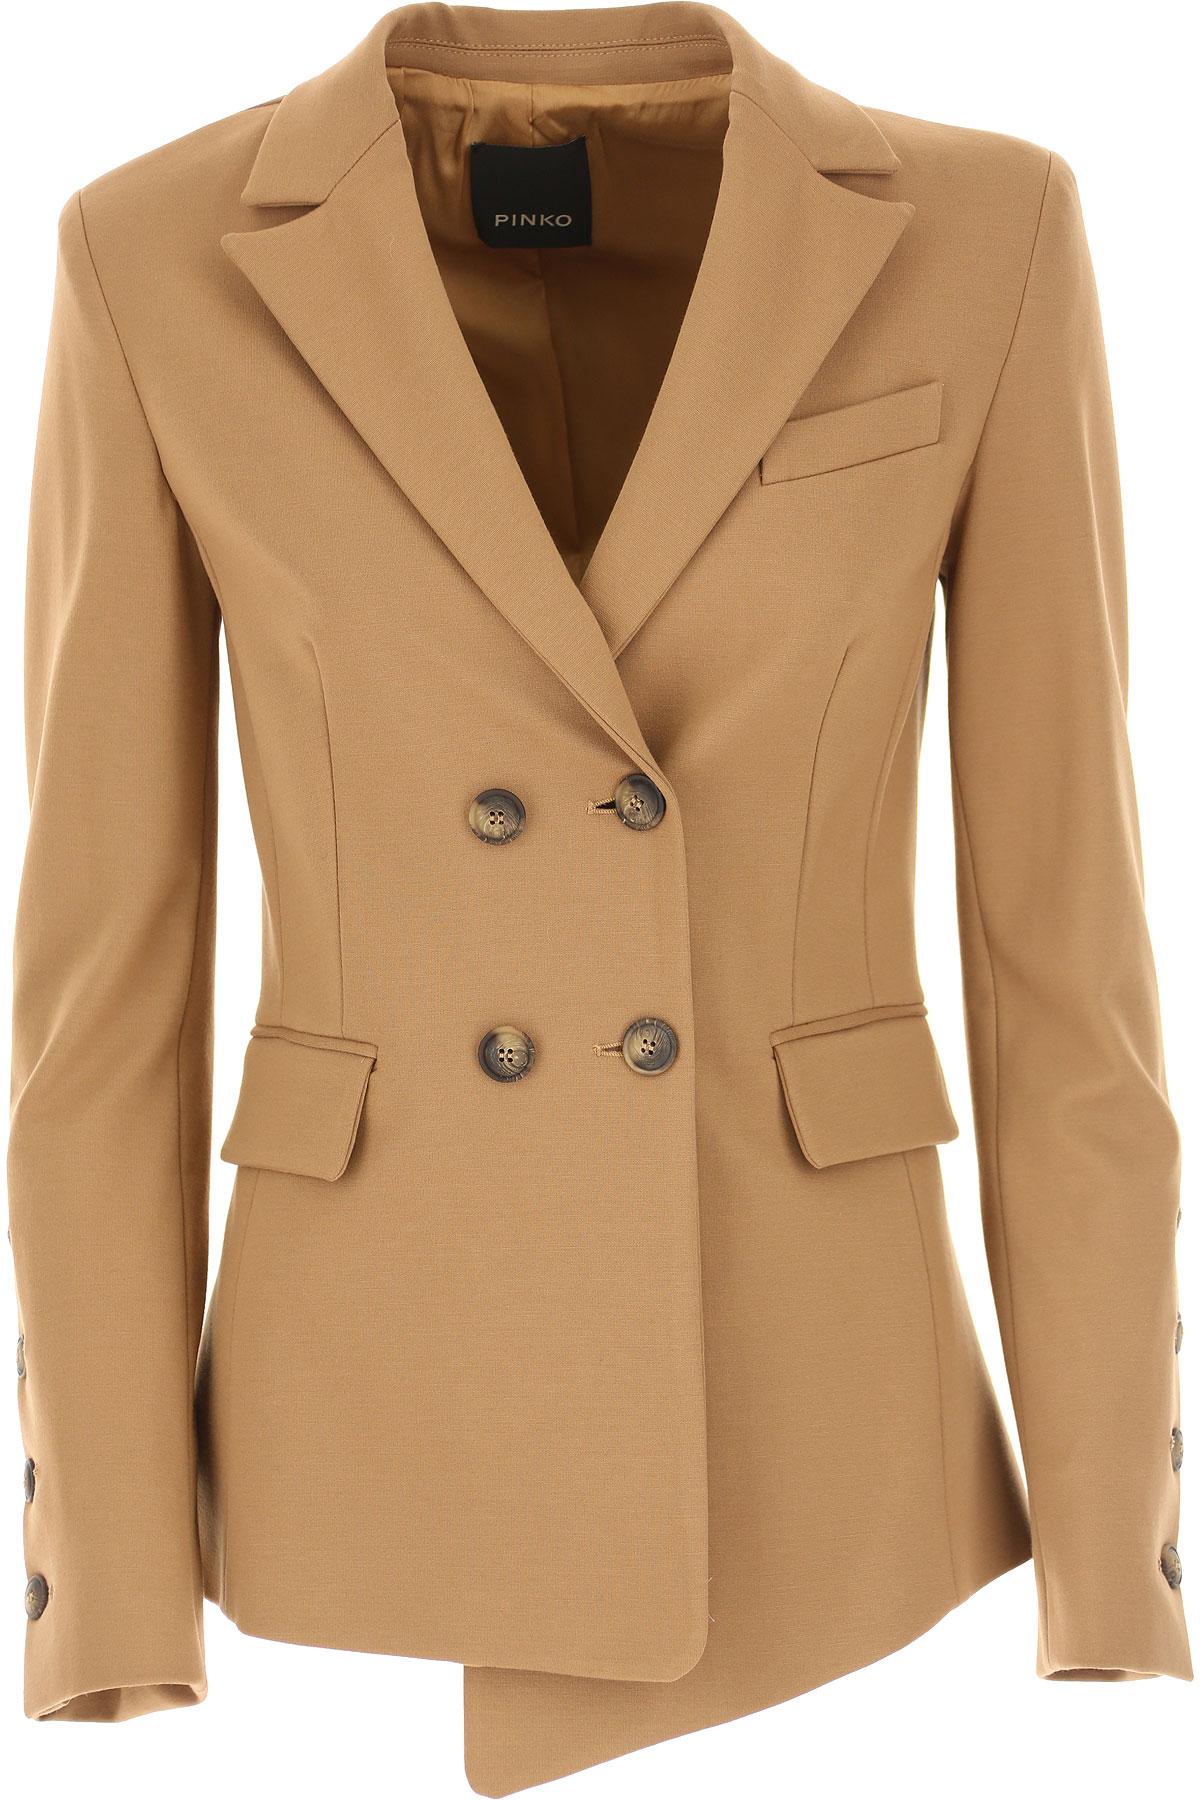 Pinko Blazer for Women On Sale, nut, Viscose, 2019, 2 4 6